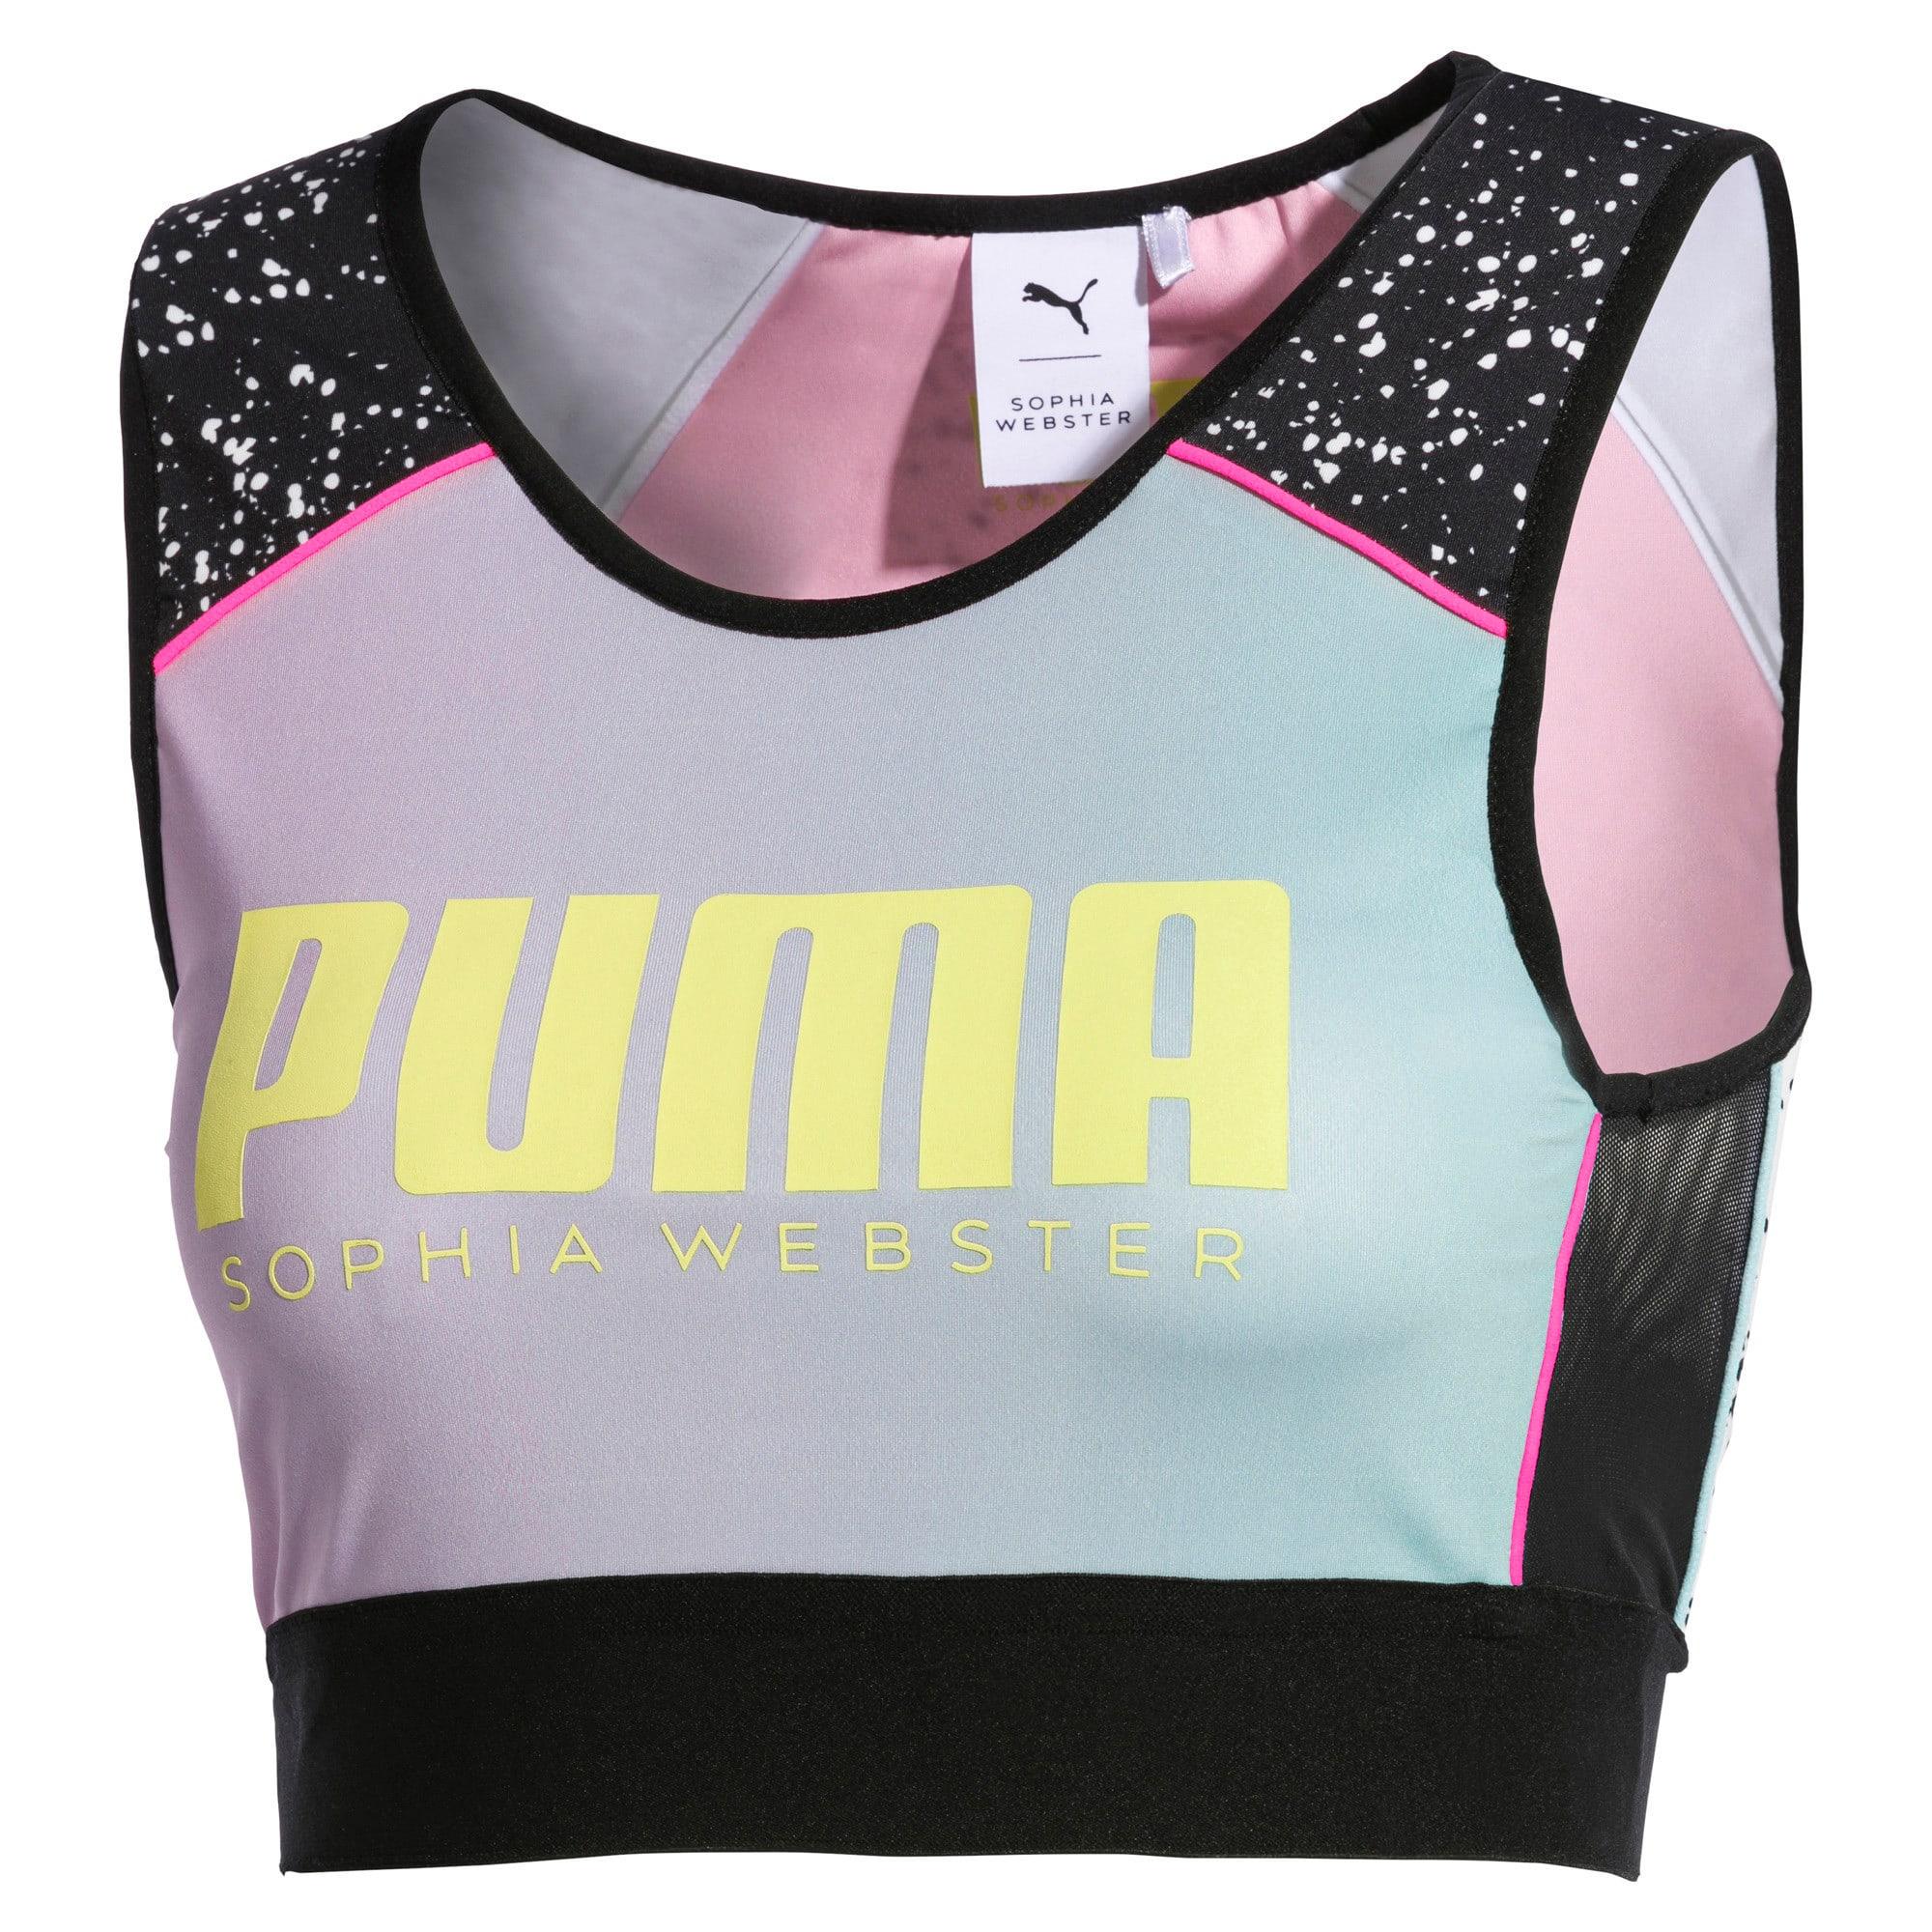 Thumbnail 7 of PUMA x SOPHIA WEBSTER Women's Reversible Crop Top, Puma White-AOP, medium